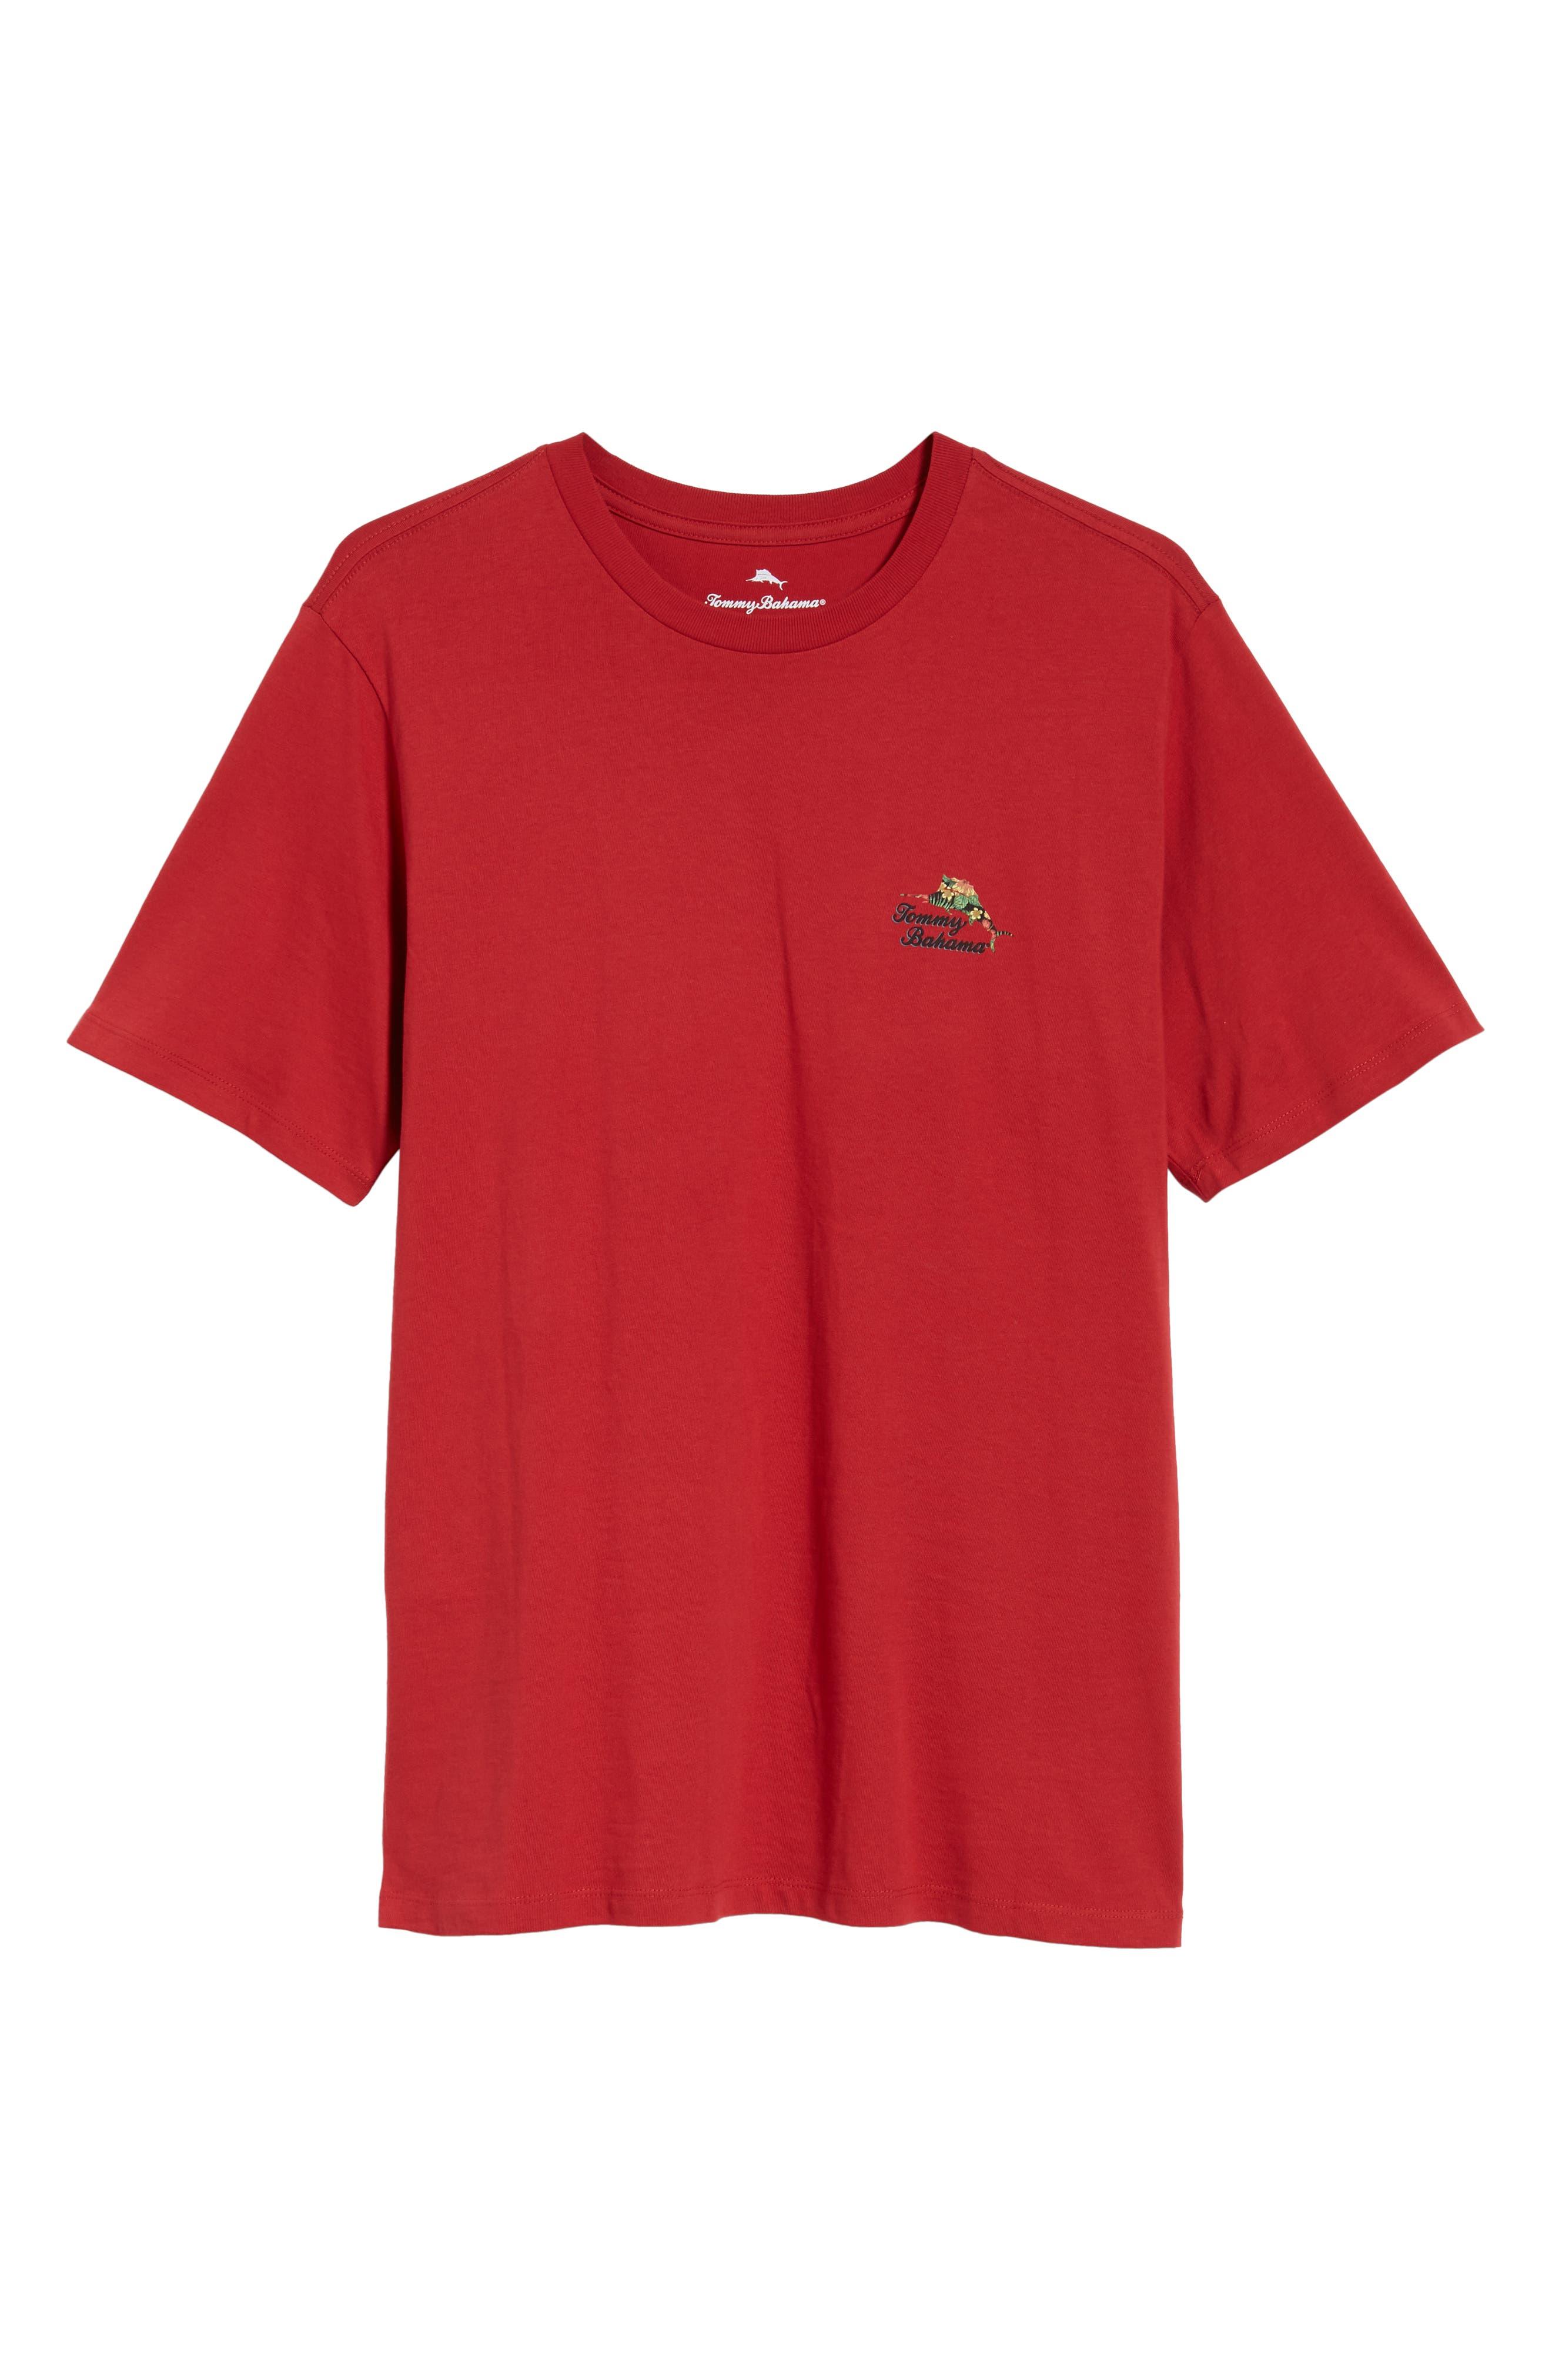 TOMMY BAHAMA, Alo-Ho Ho-Ha Graphic T-Shirt, Alternate thumbnail 6, color, SCOOTER RED